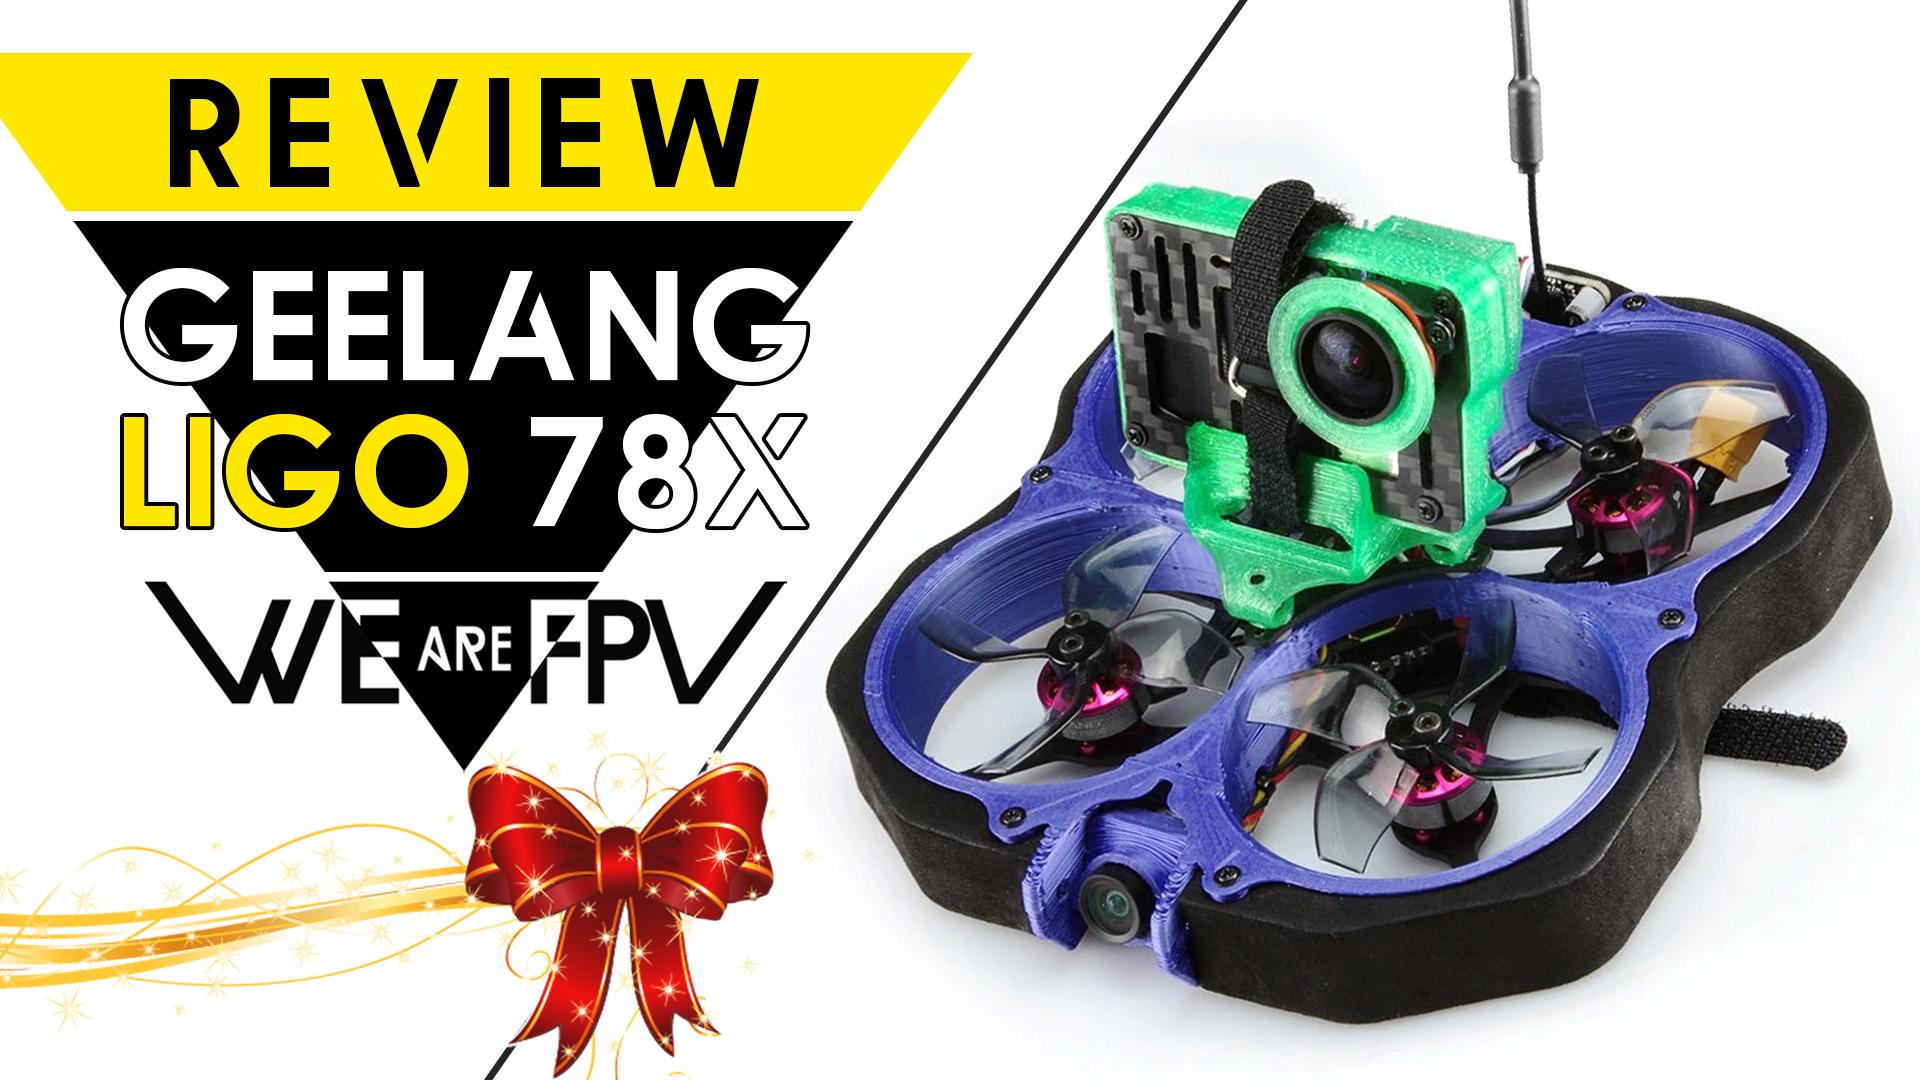 test Geelang Ligo review giveaway